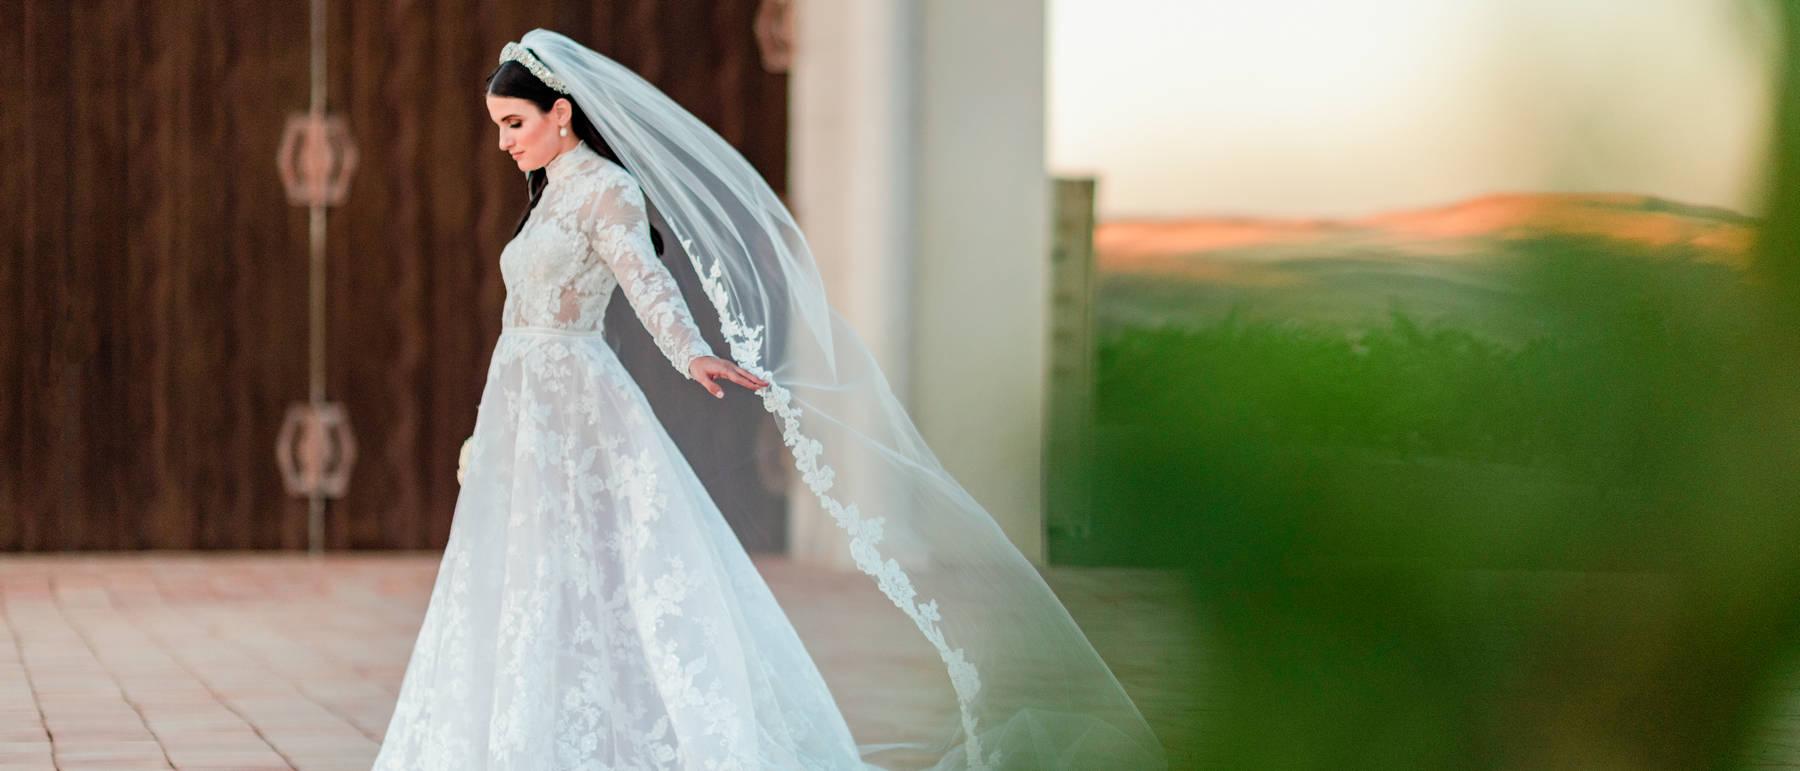 johnandjoseph-wedding-photographer-hz-slider-282